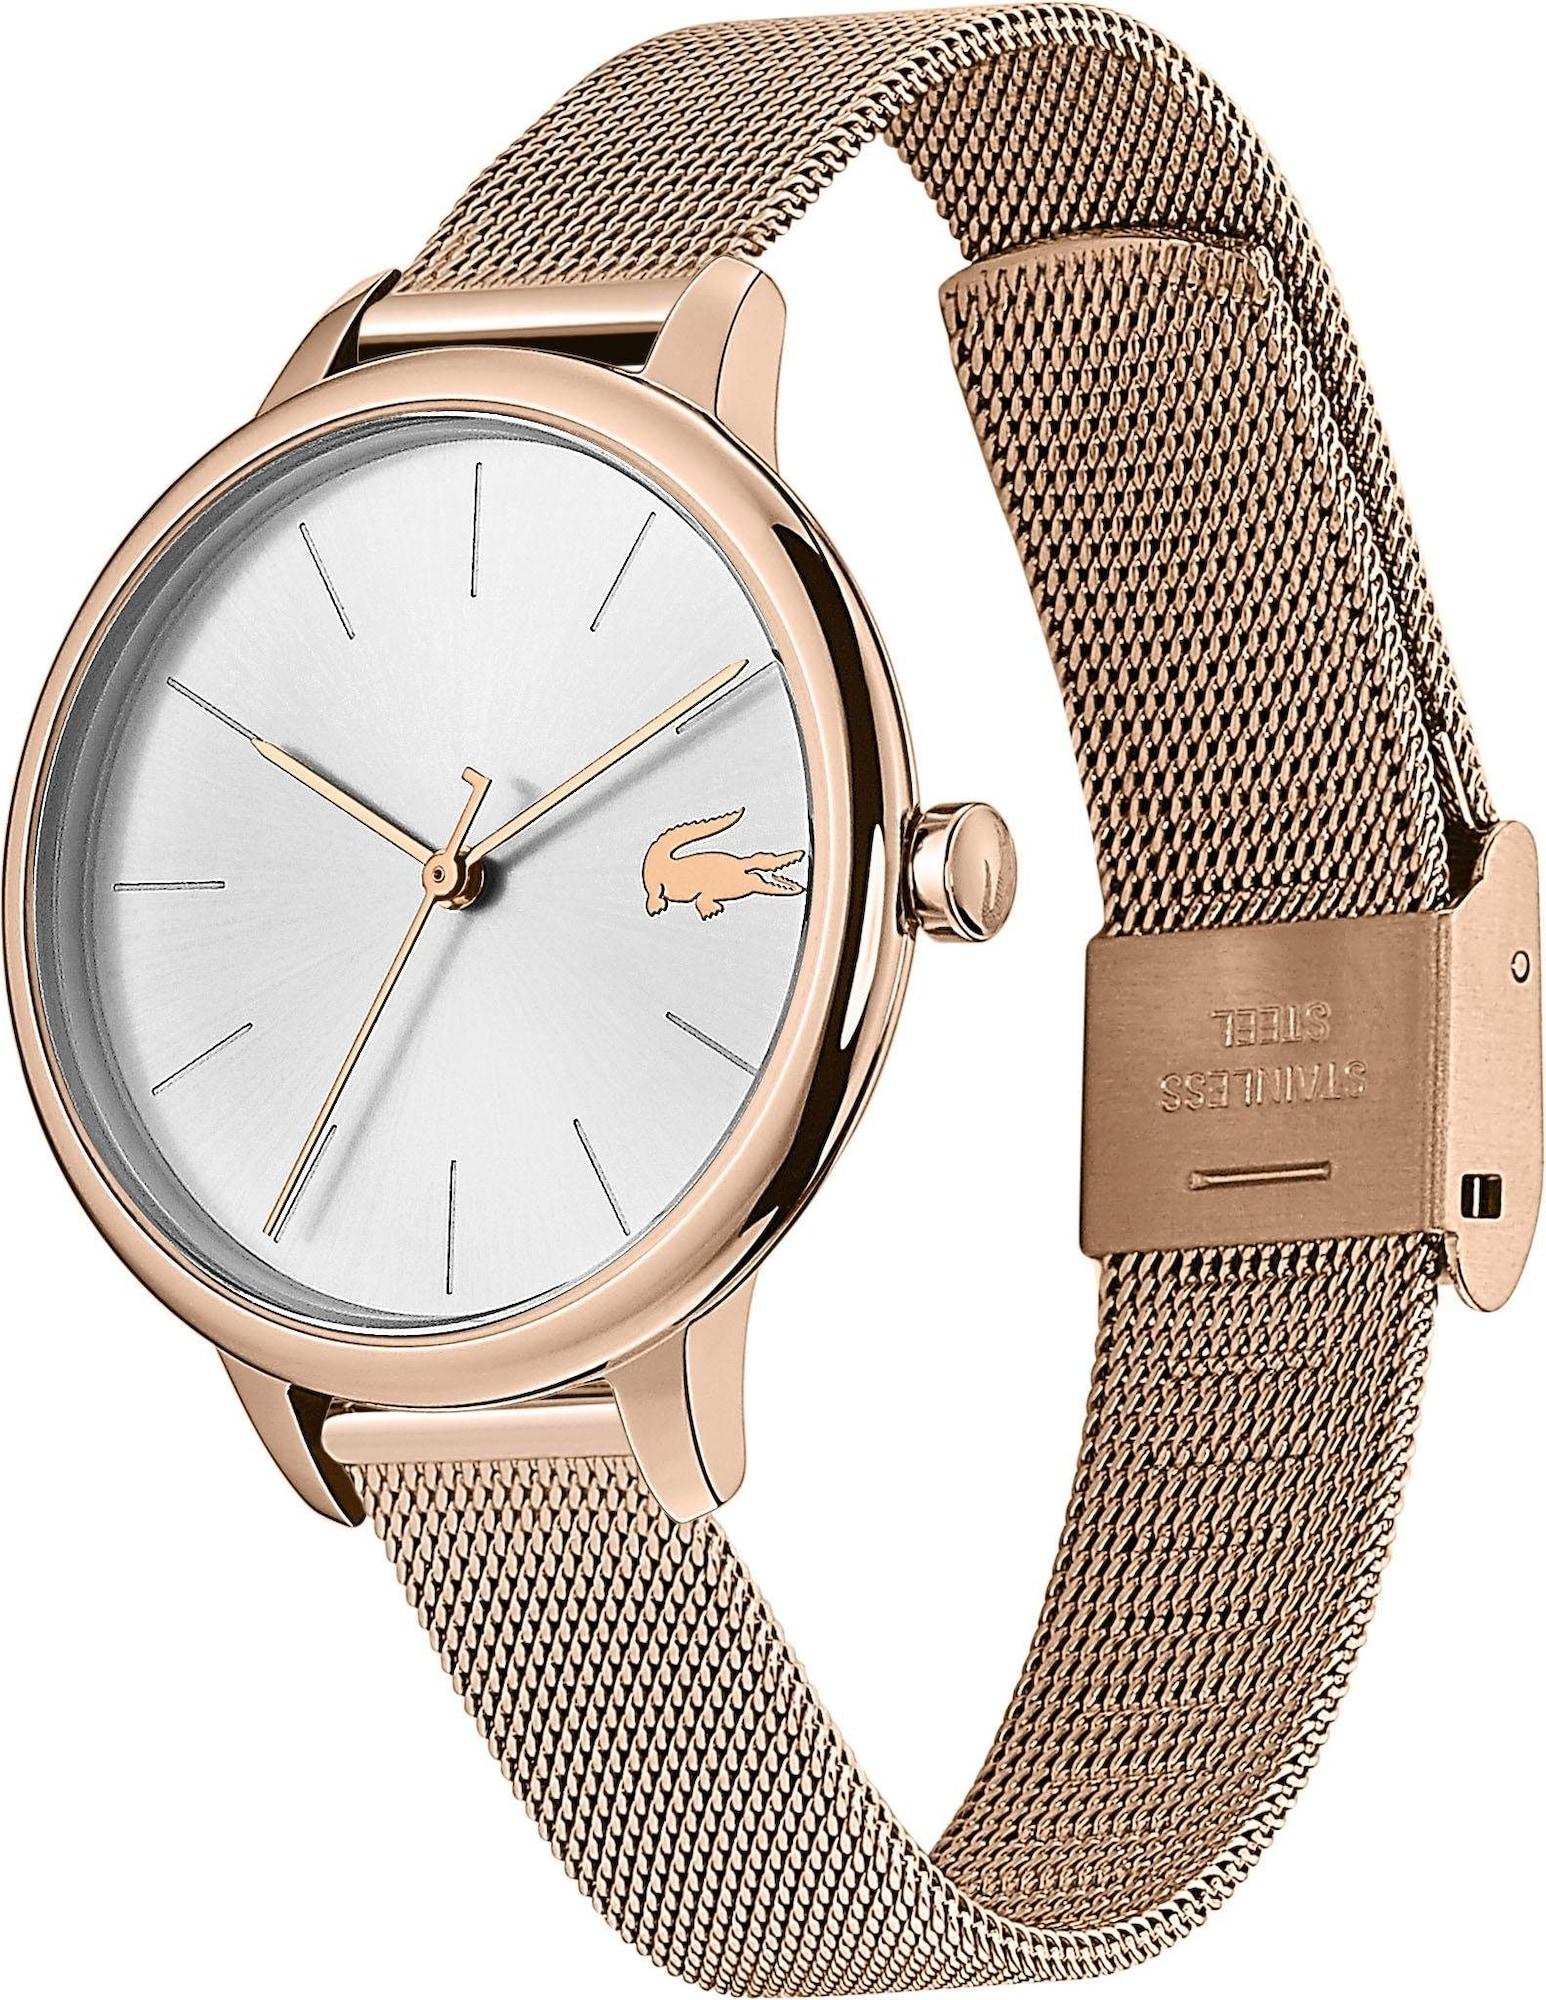 Analoog horloge Cannes 2001103